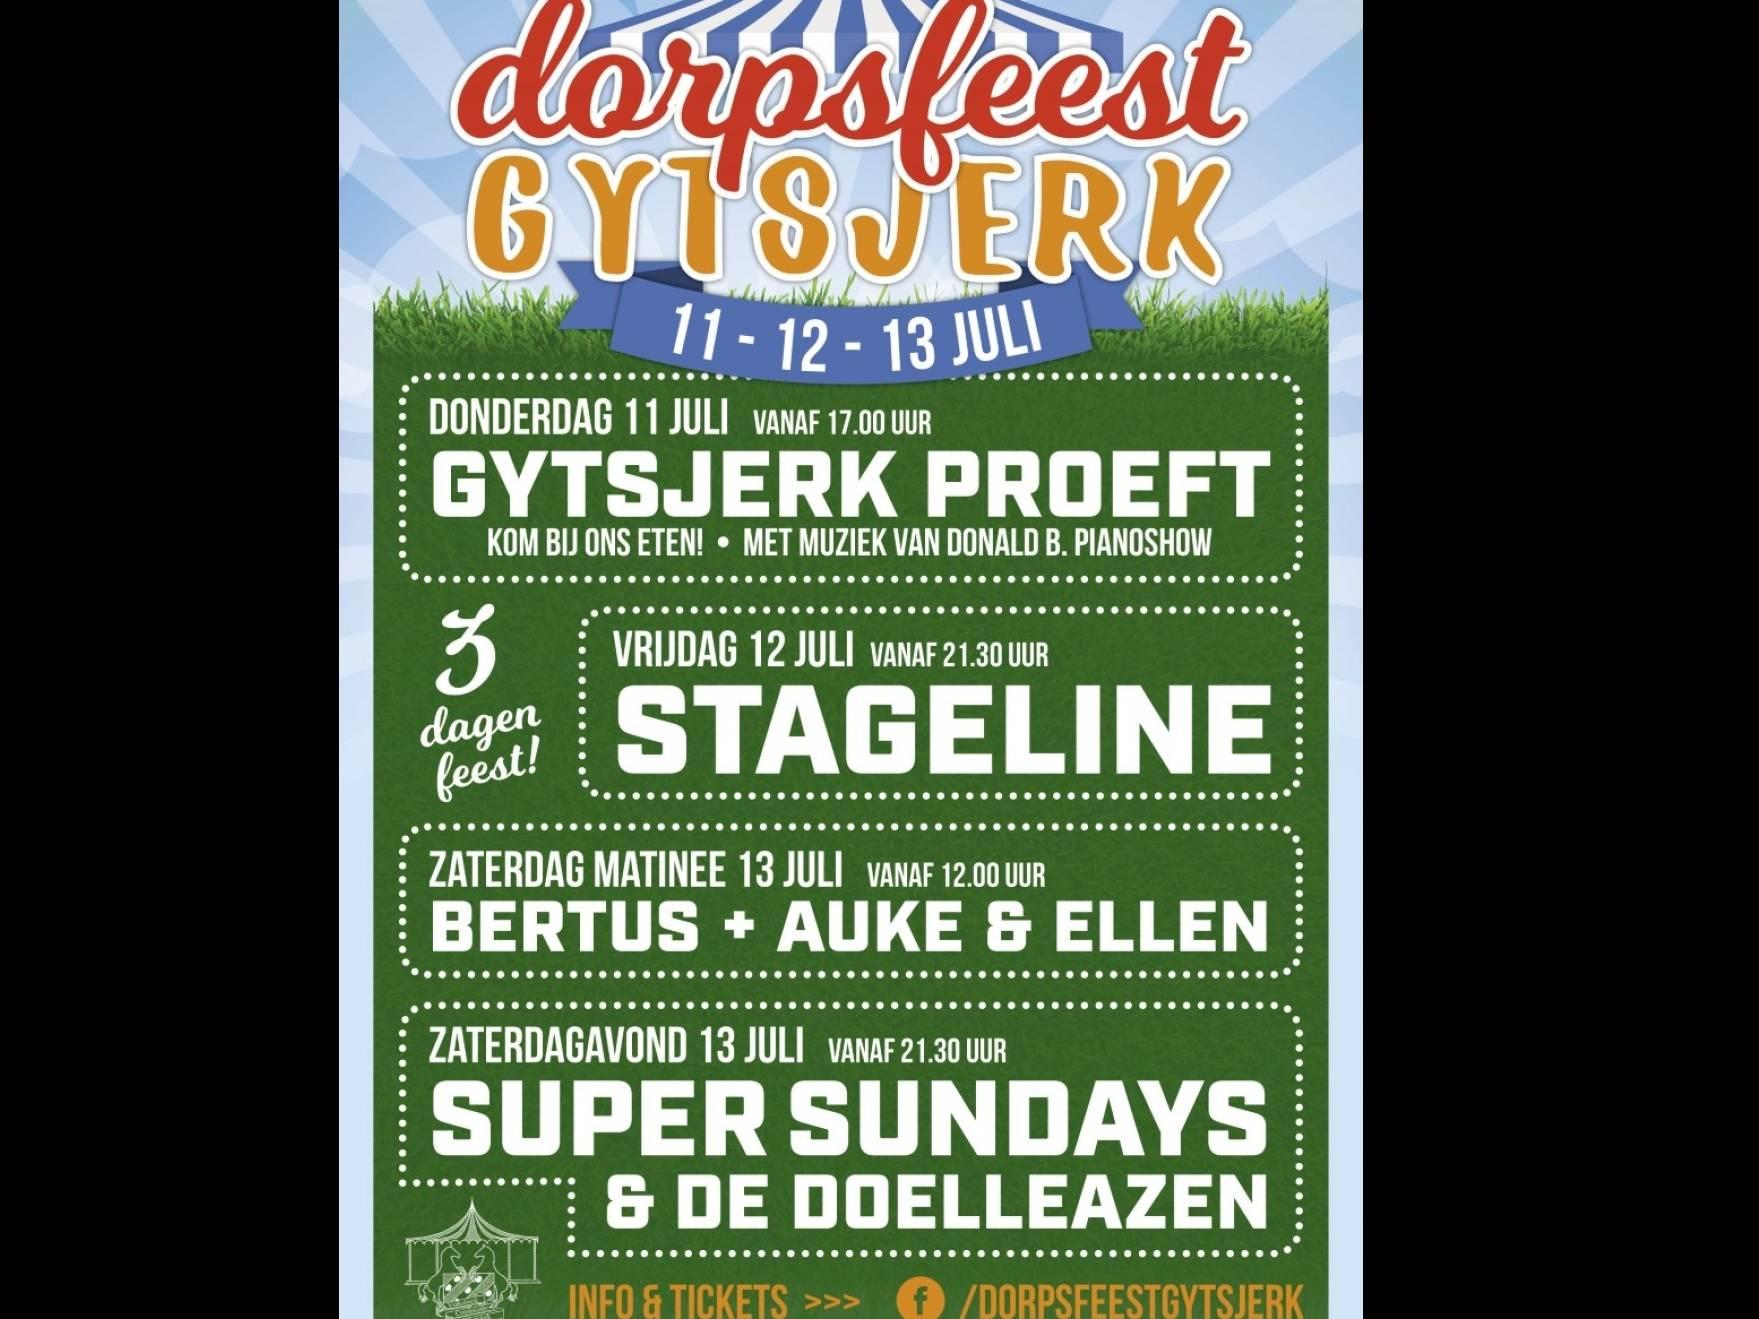 Dorpsfeest Gytsjerk zaterdag 13 juli 2019